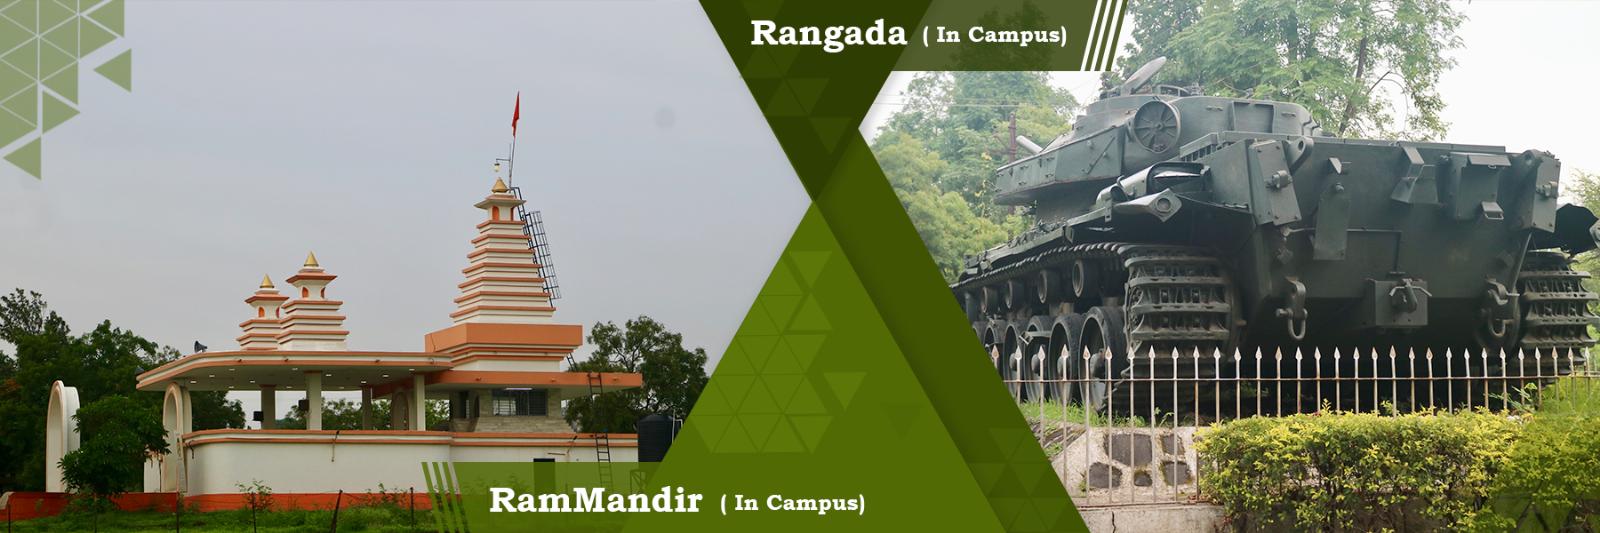 RanGada & RamMandir in Ca